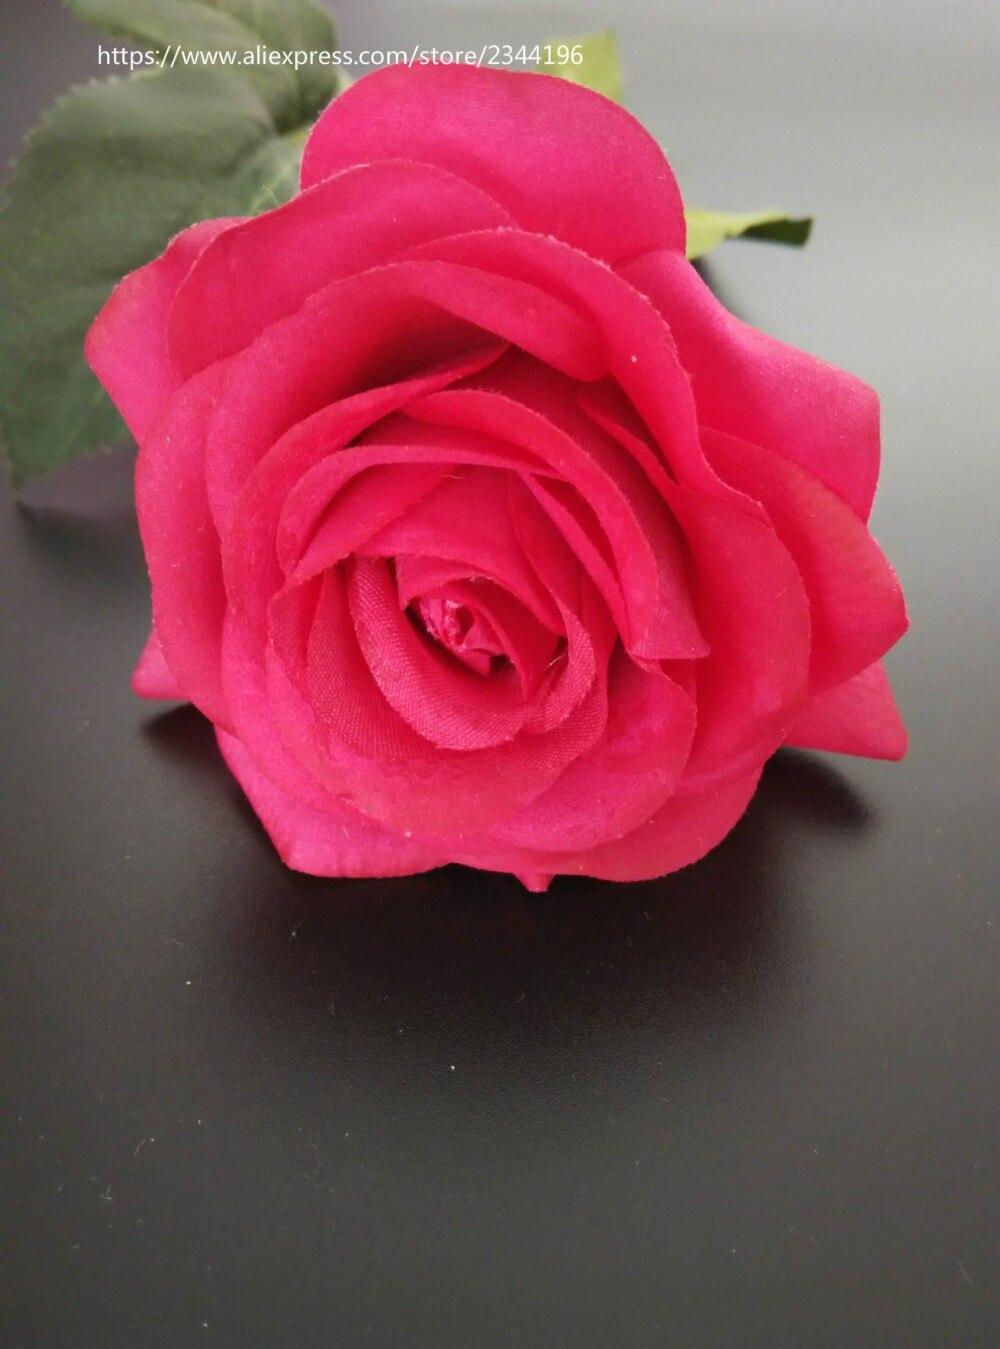 Single Shocking Pink Rose For Baby Girl Birthday Wedding Decoration